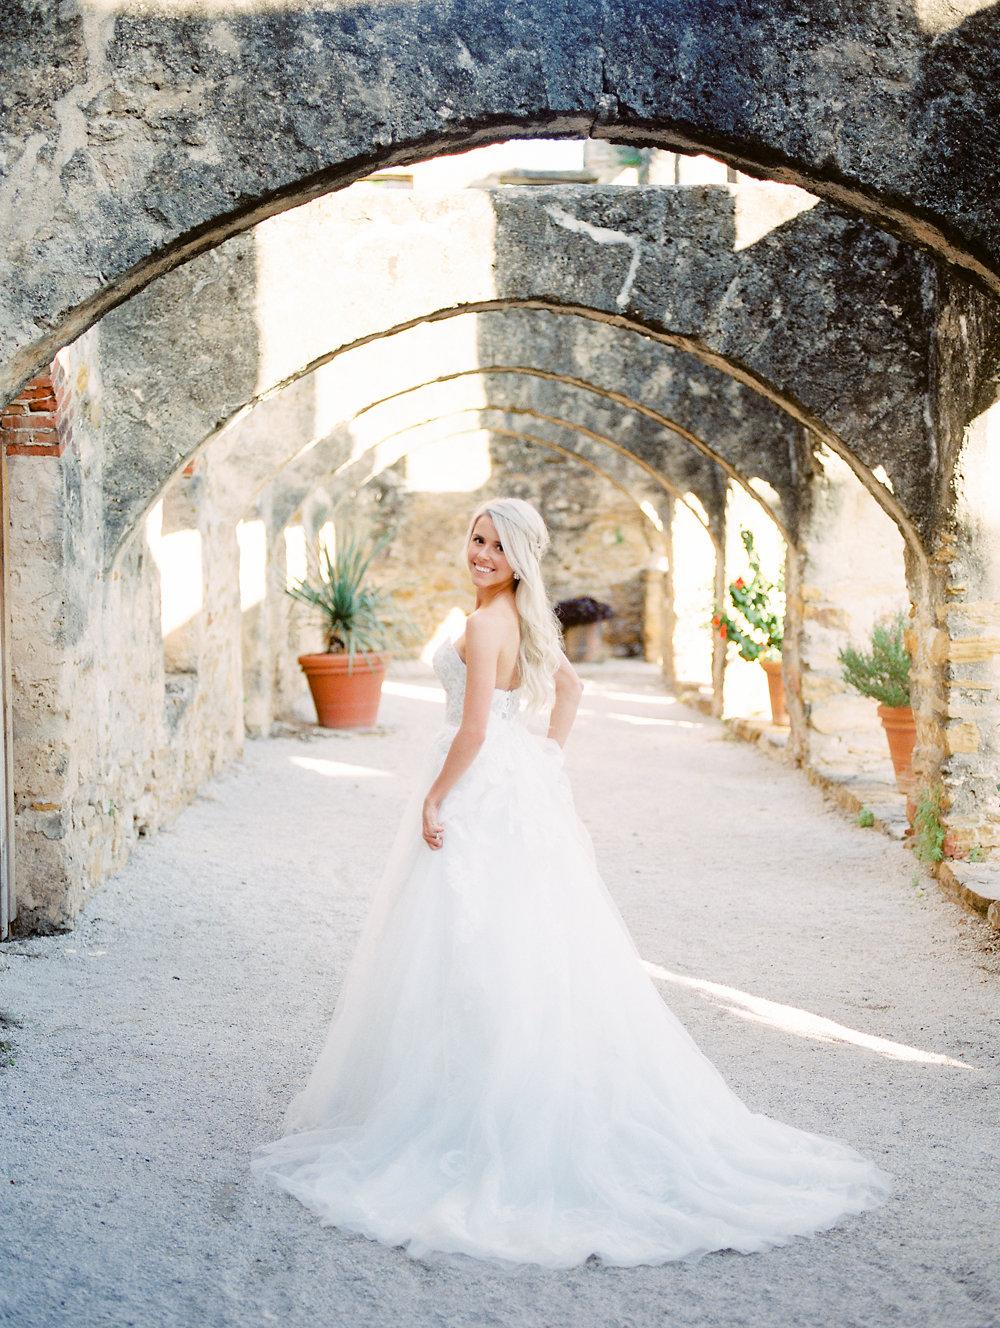 Best-Austin-Denver-California-Wedding-Photographers-fine-art-film-Bridal-session-Mission-San-Jose-San-Antonio-18.jpg